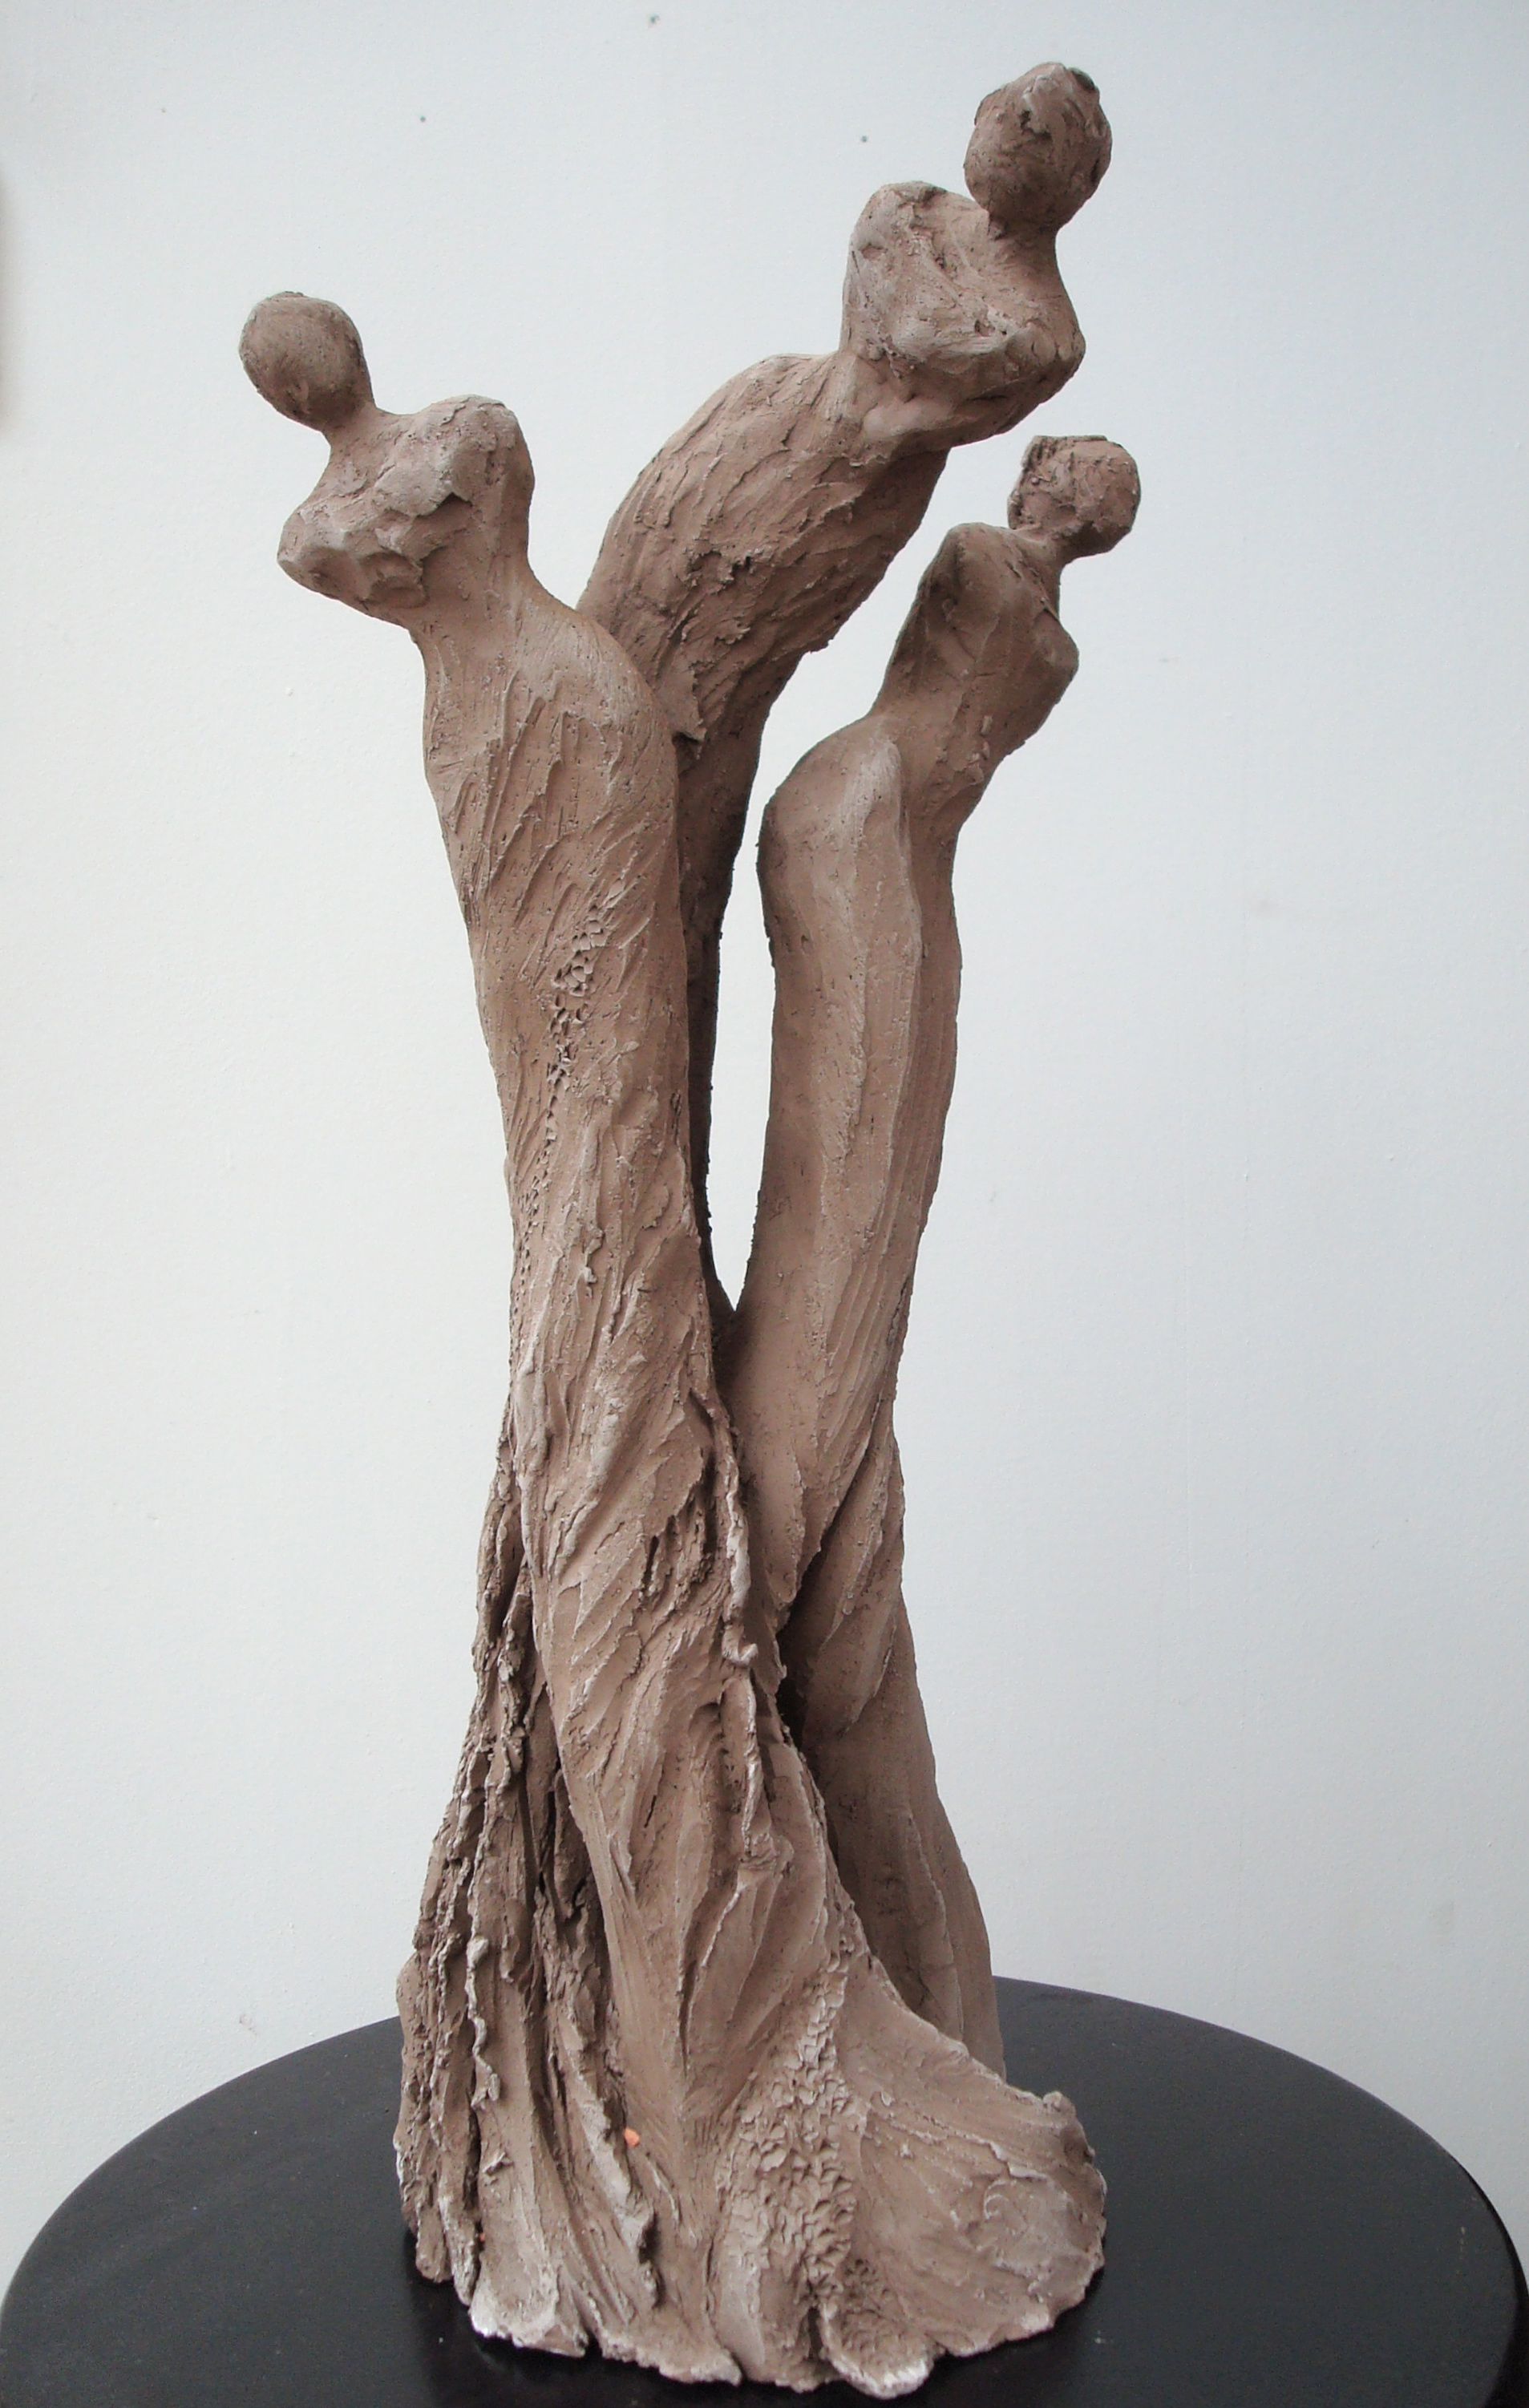 Hervorragend sculpture | Clang artiste peintre OI47